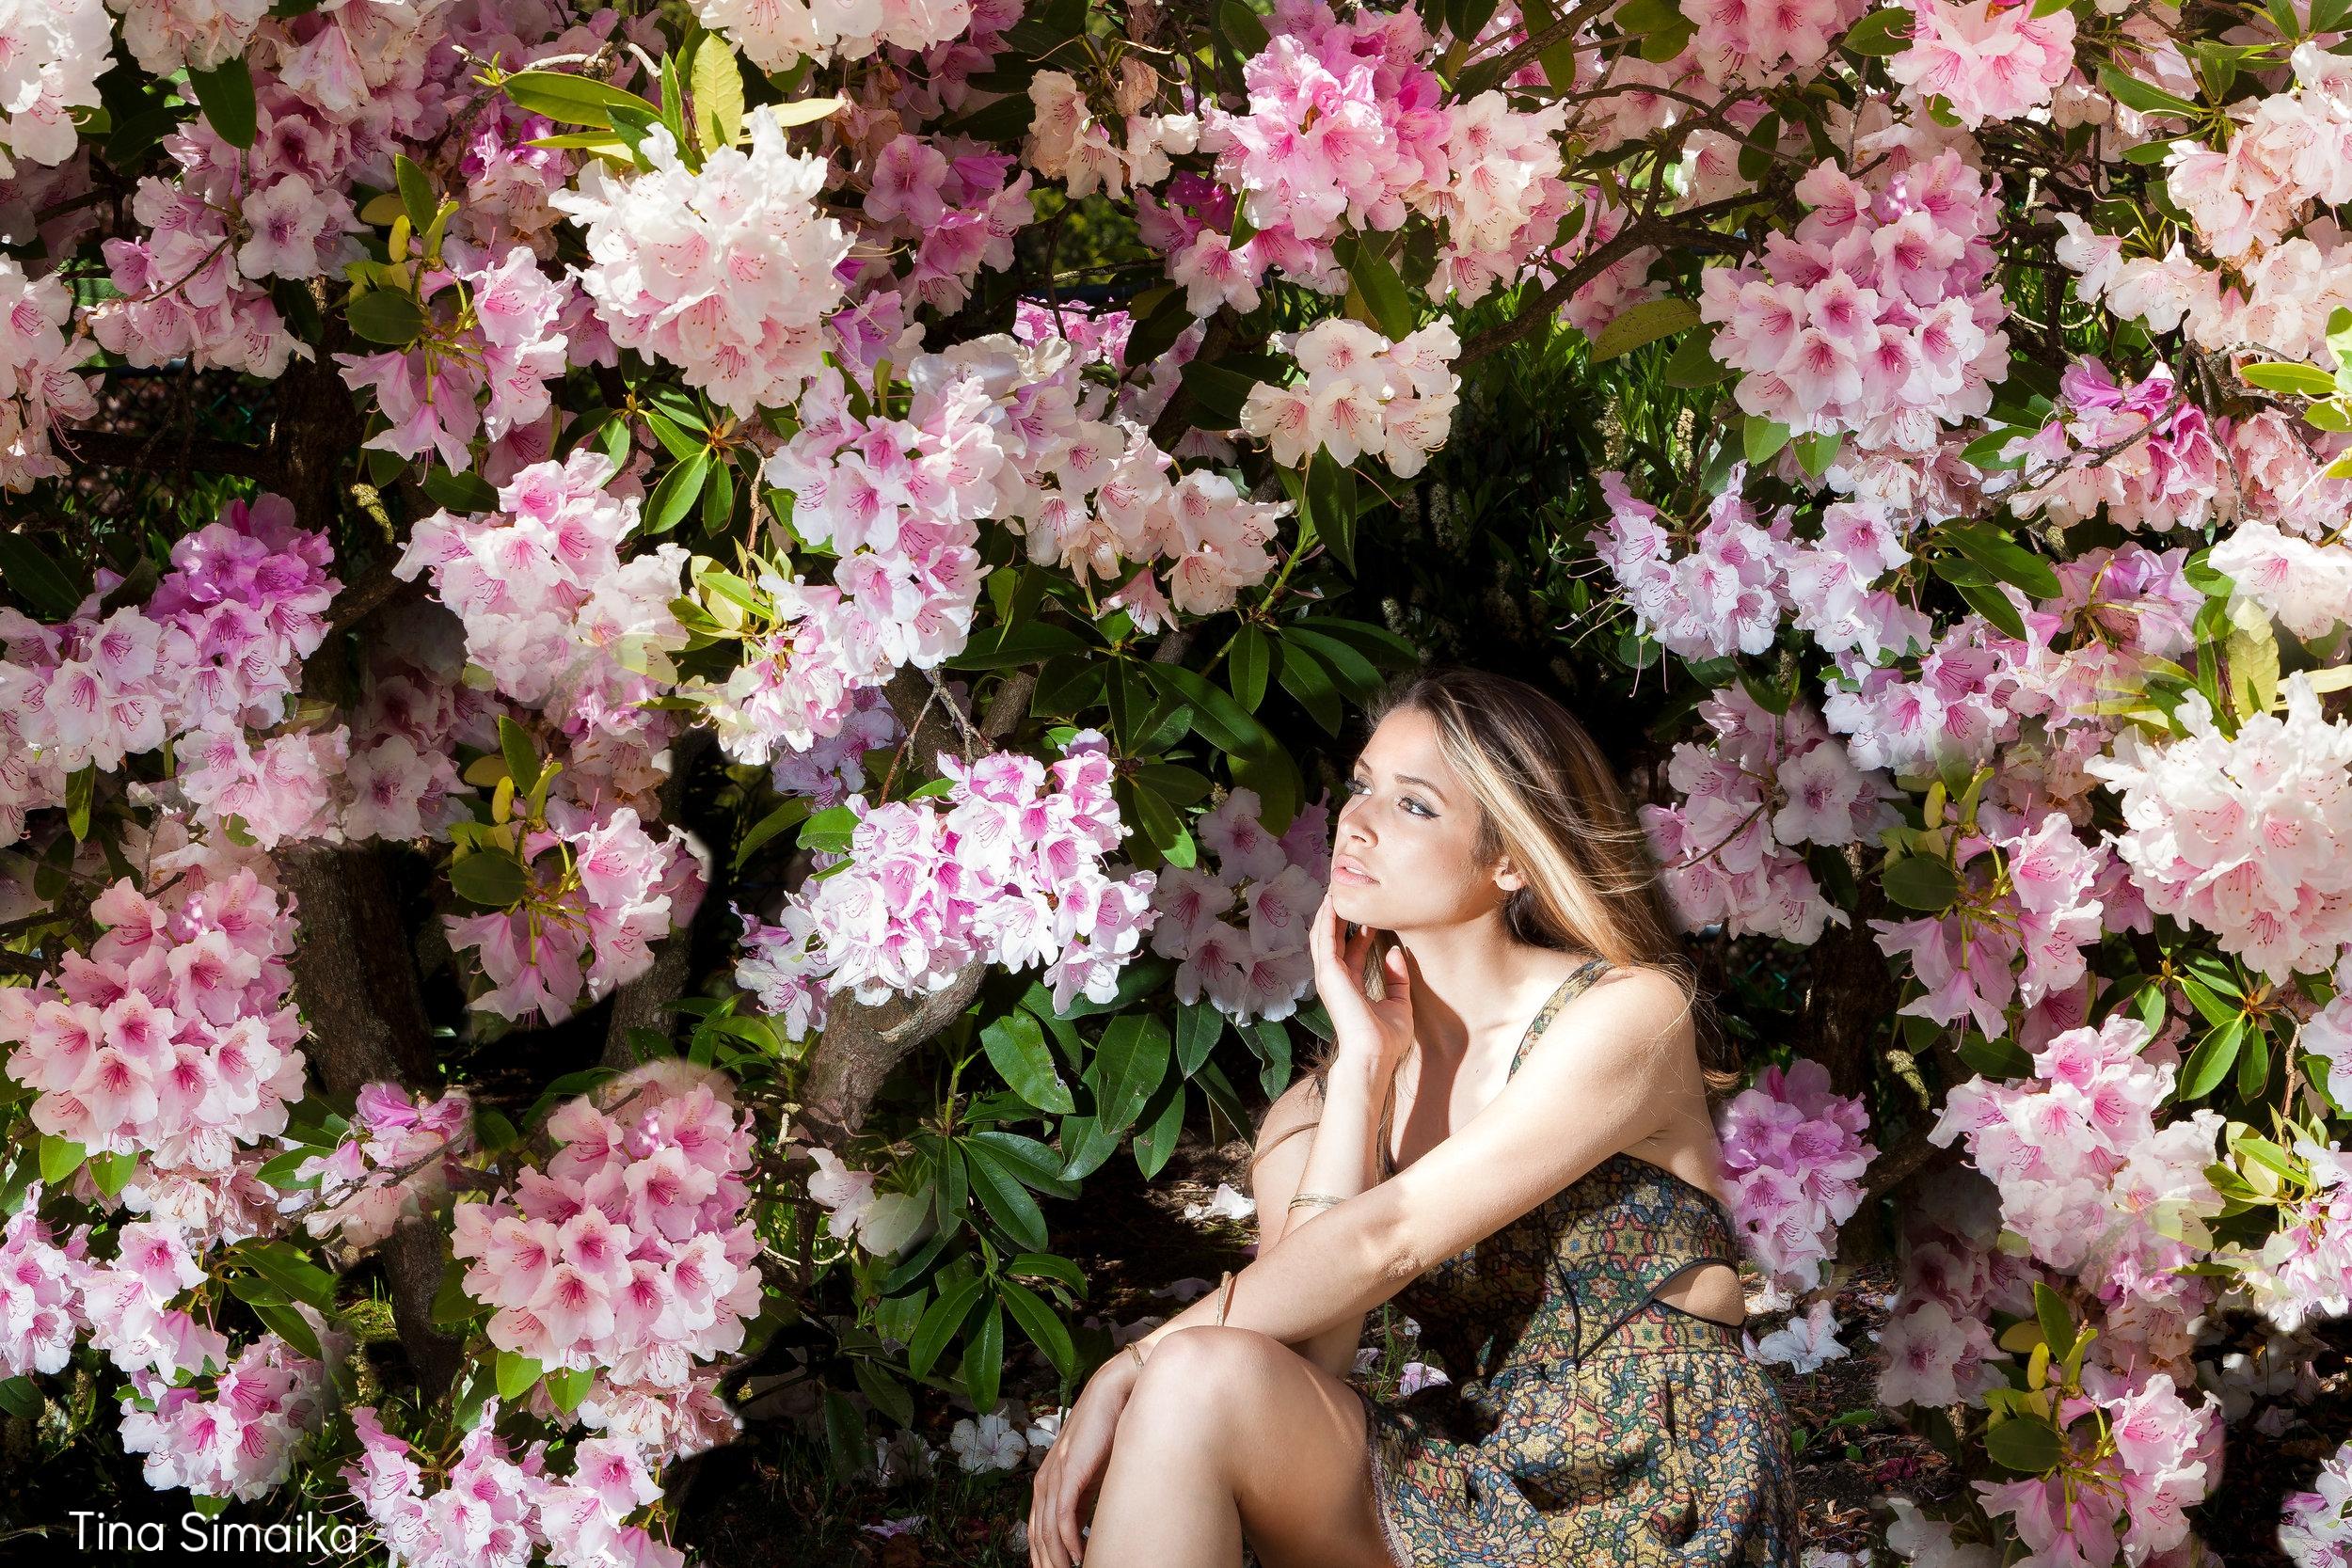 Photo_Tina_Simaika_Model_Esme_Borisoff-39.jpg